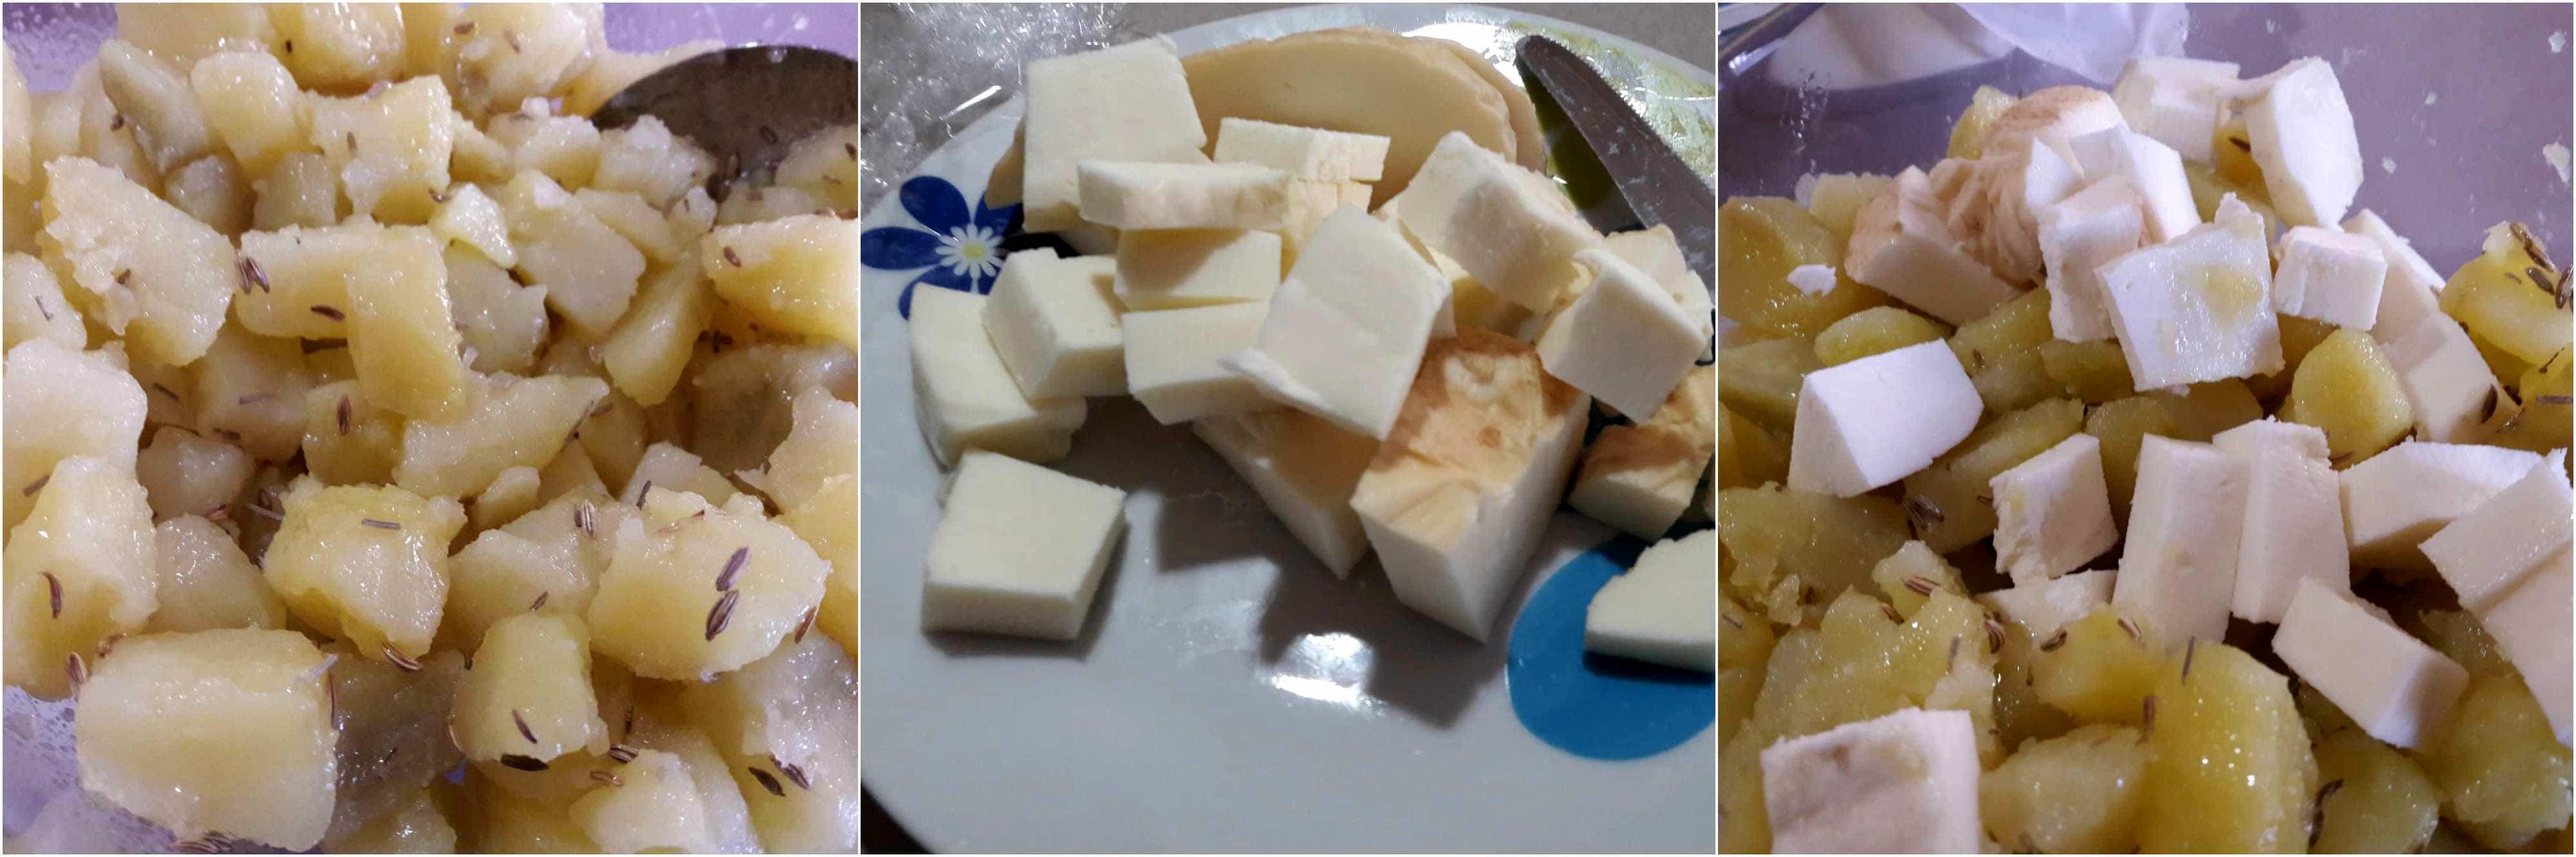 torta patate formaggi box 1-2